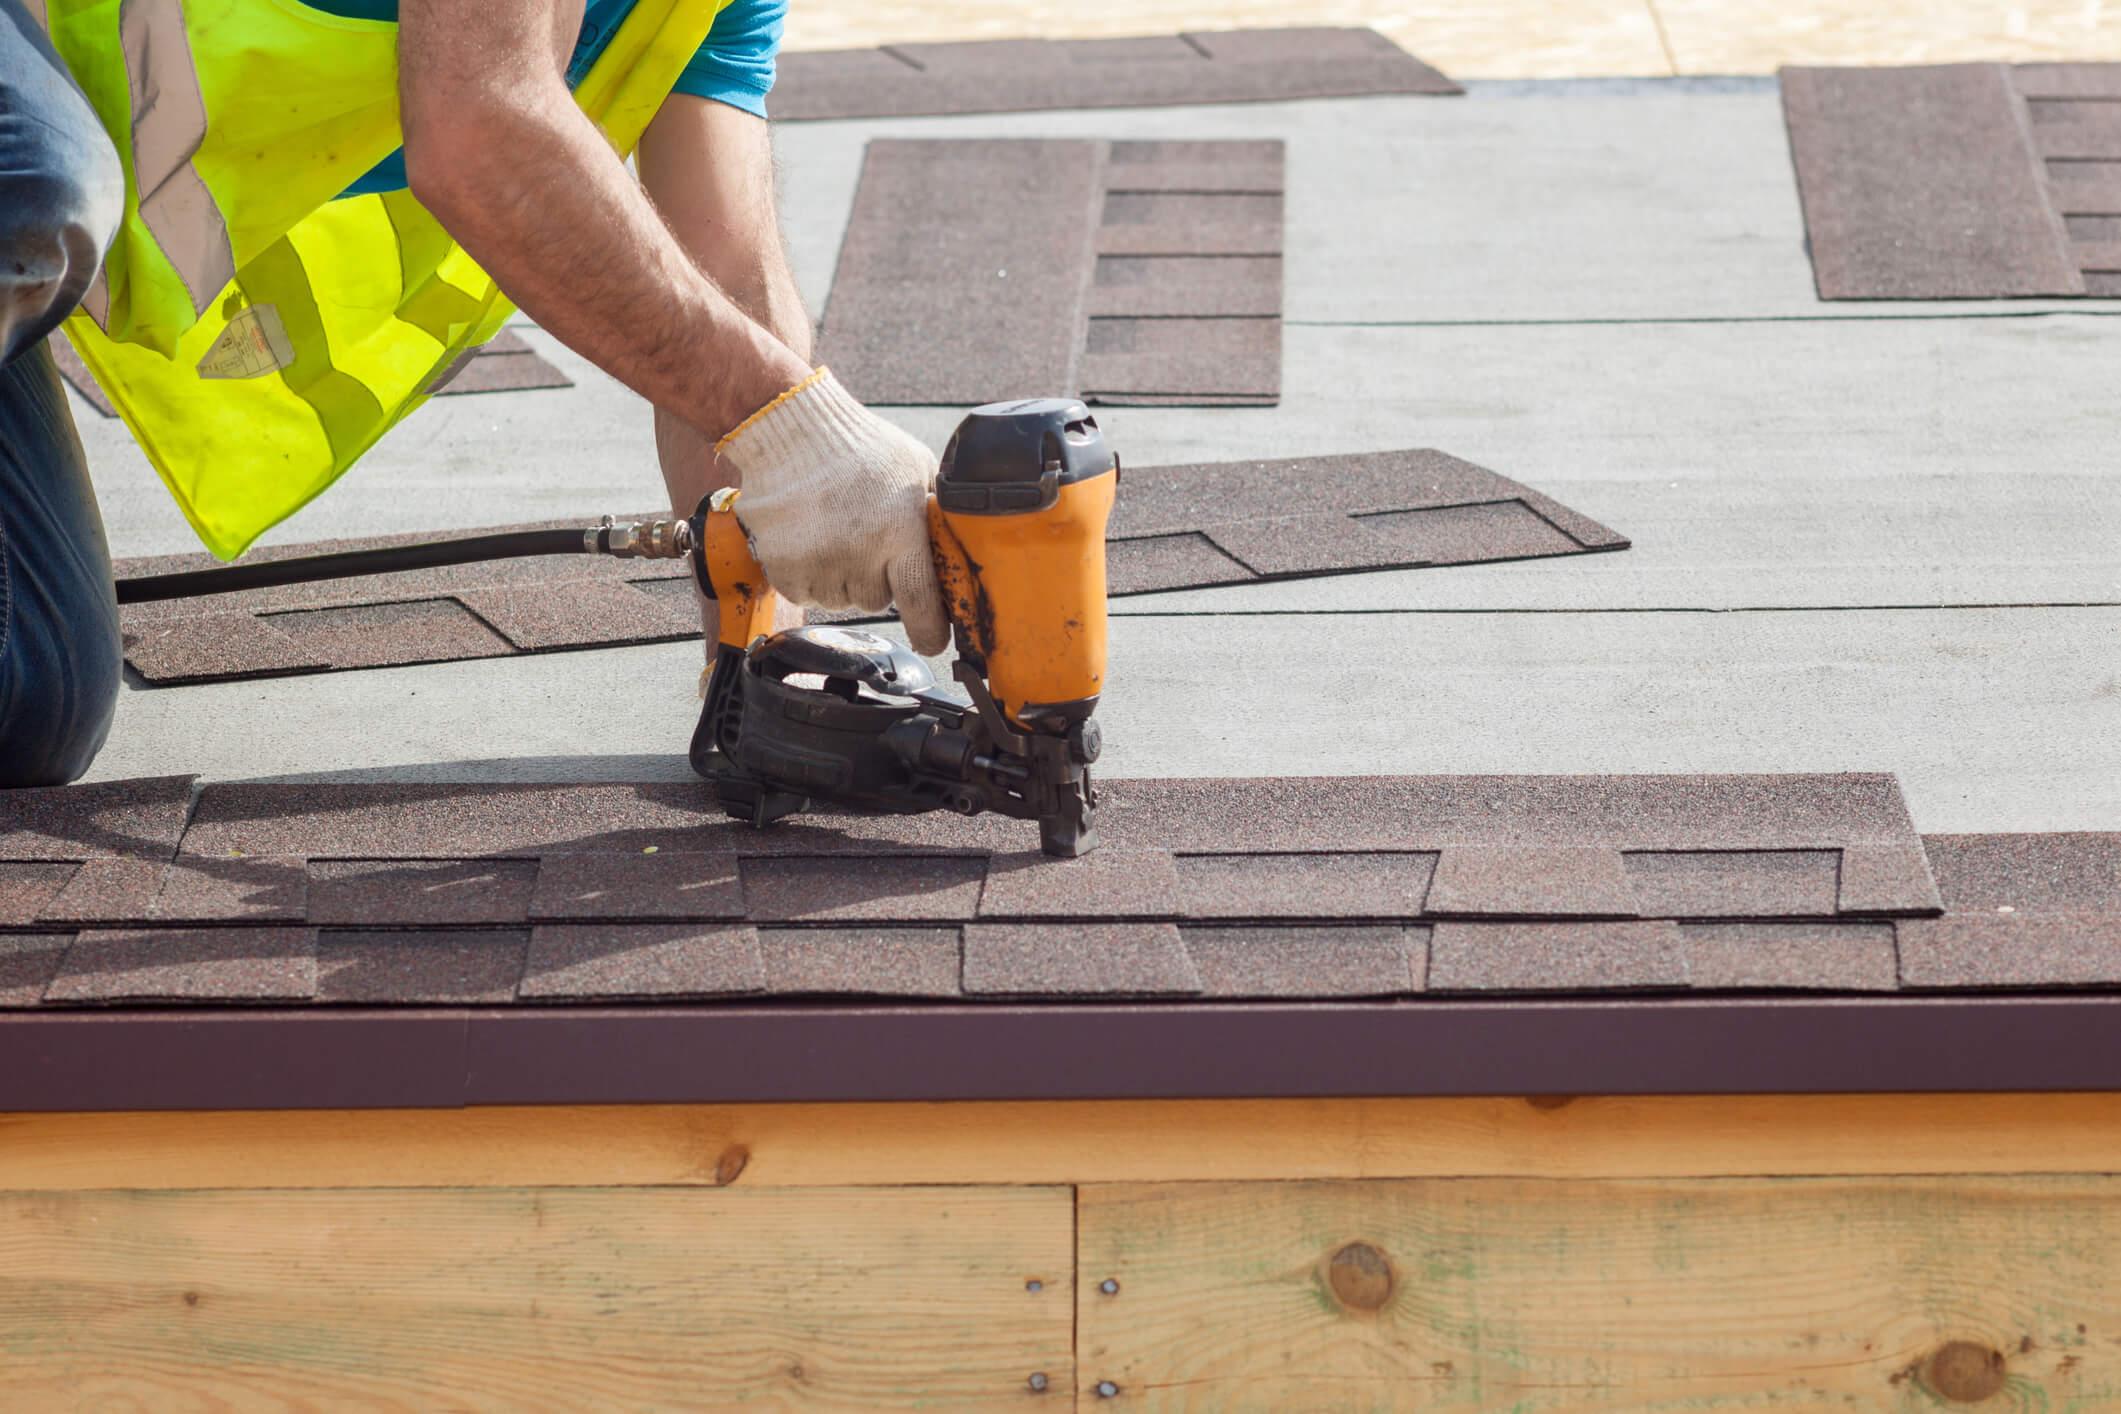 Roofer nailing tiles.